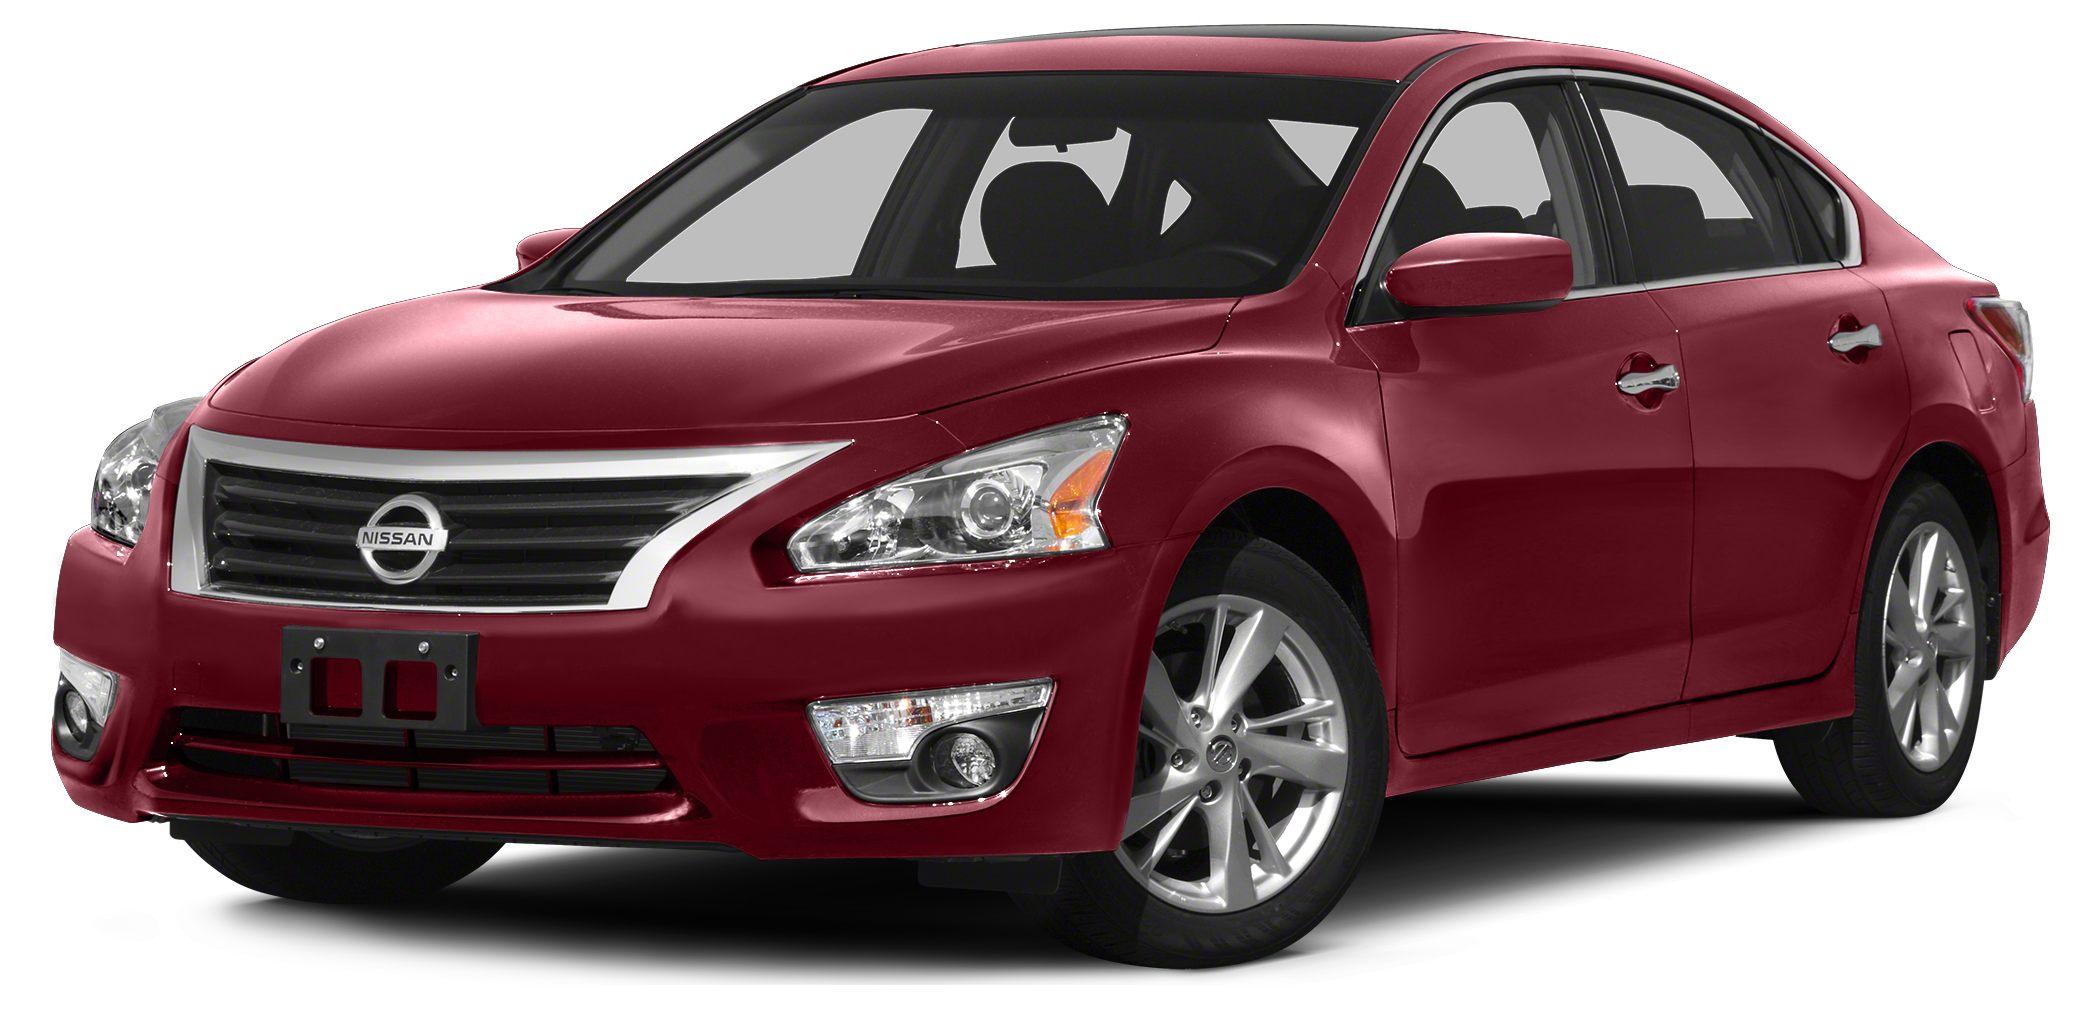 2013 Nissan Altima 25 SV Miles 63288Color Cayenne Red Metallic Stock PN17101 VIN 1N4AL3AP2D